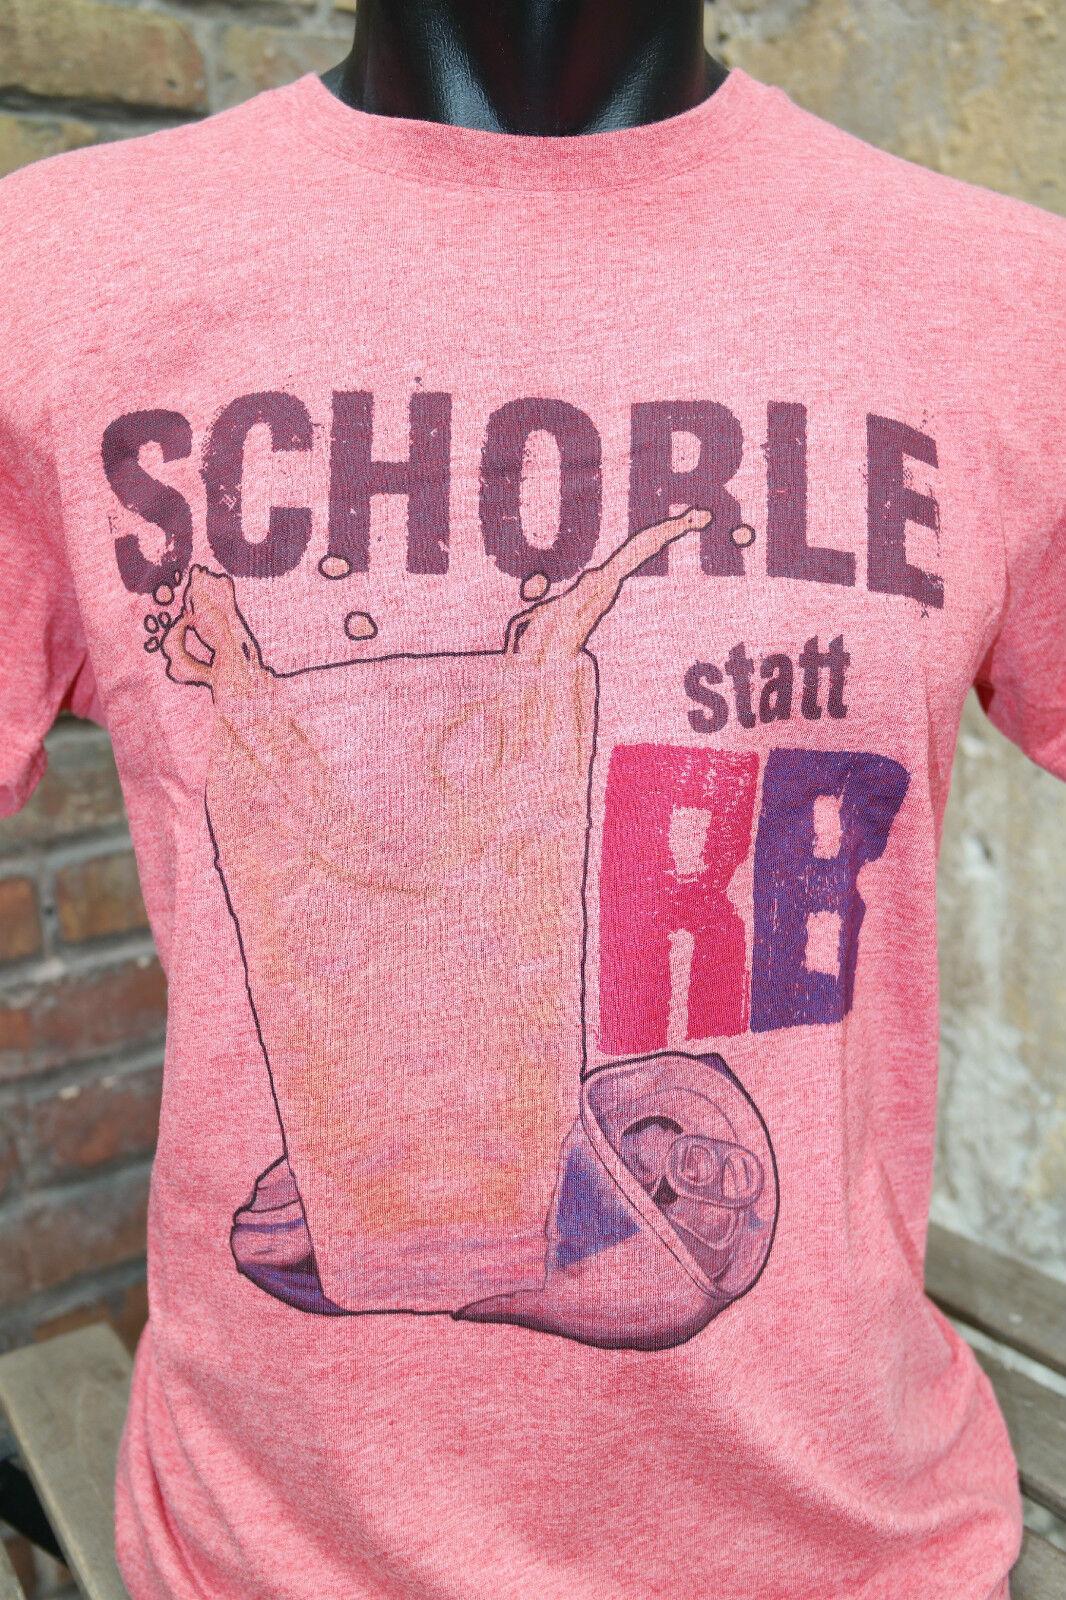 Schorle Statt Rb Fun Fan Shirt Fußball Bundesliga Fck